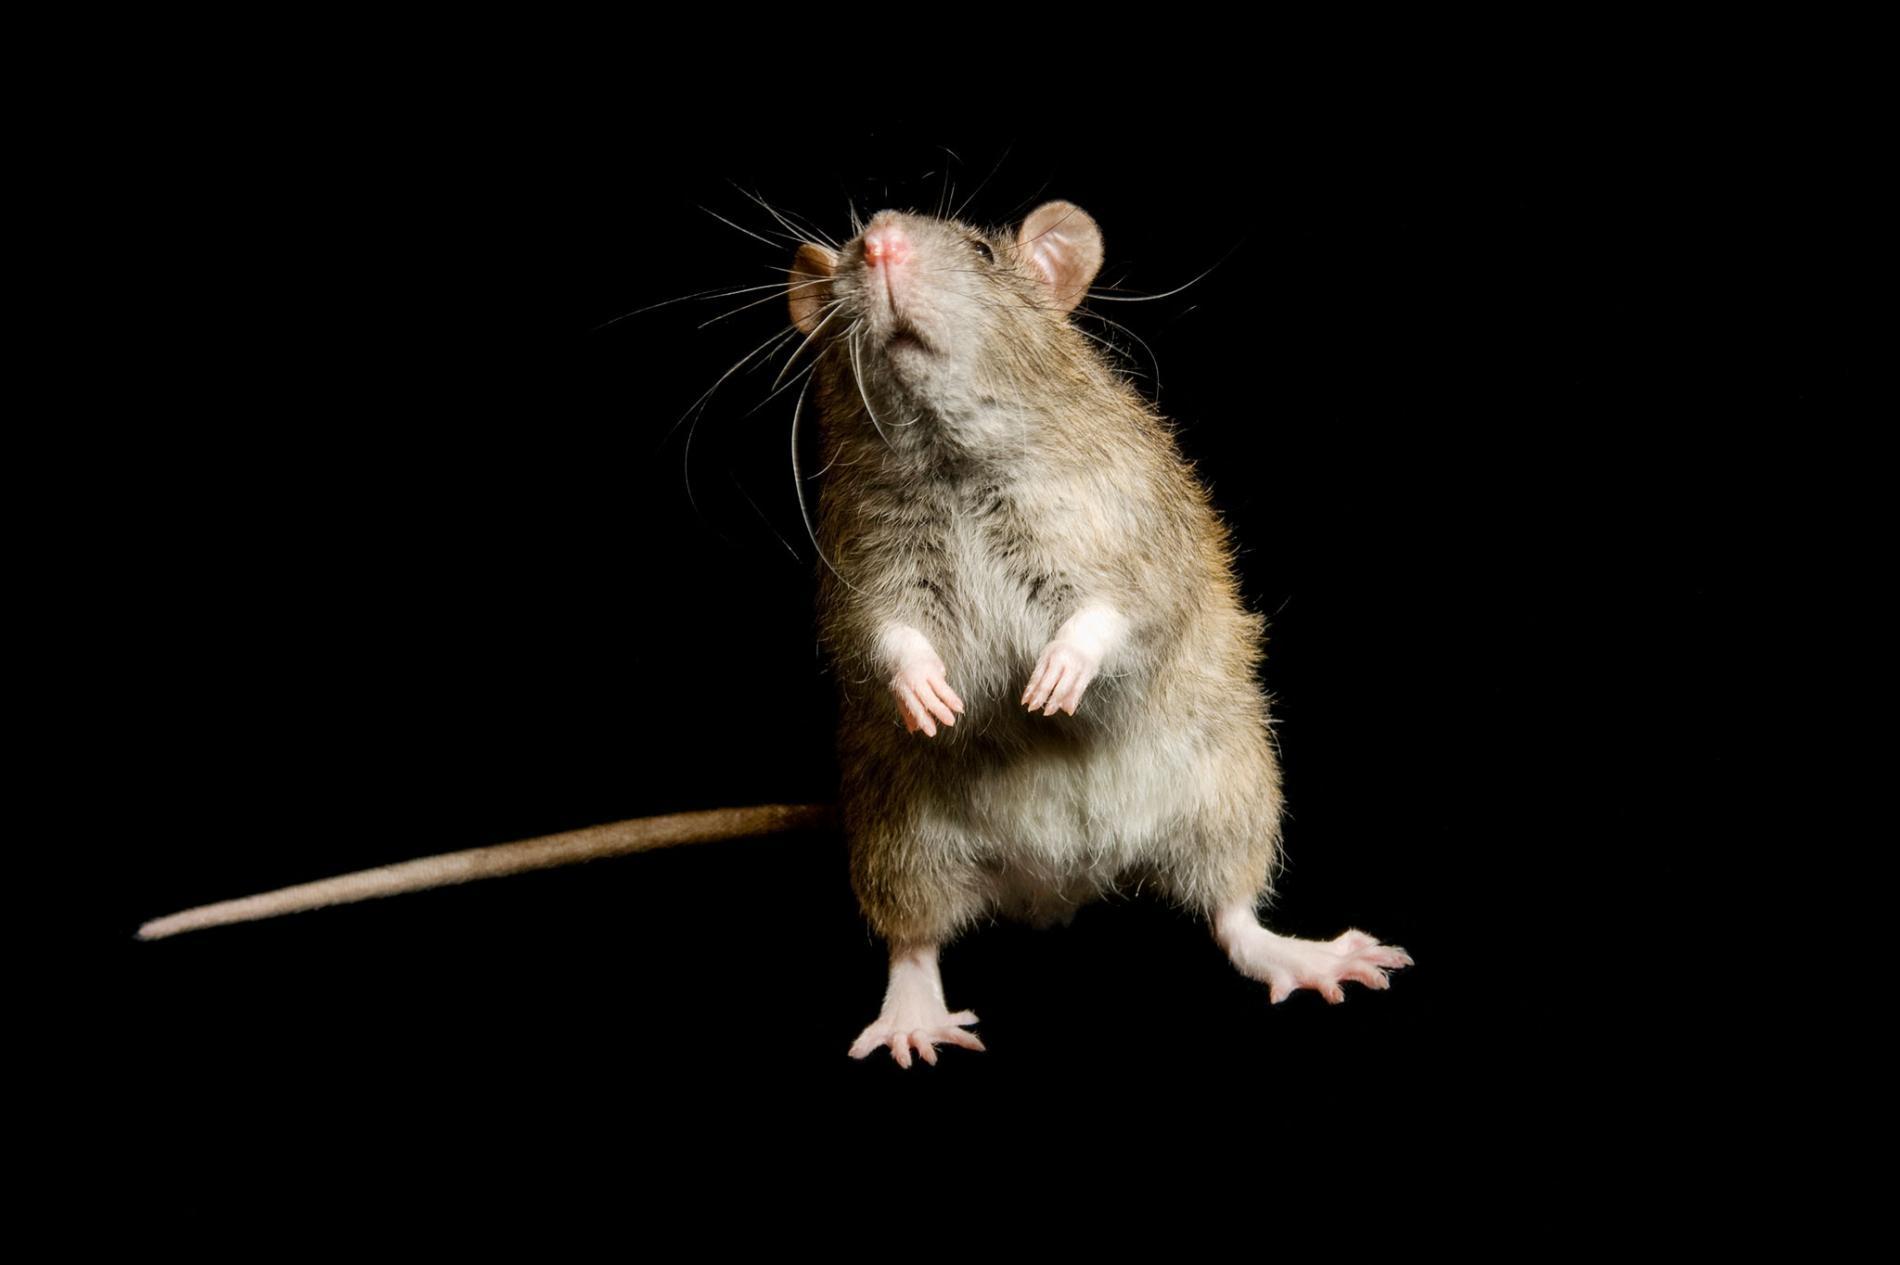 喬治米克施薩頓鳥類研究中心(George M. Sutton Avian Research Center)裡的一隻家鼠(Rattus rattus)。PHOTOGRAPH BY JOEL SARTORE, NATIONAL GEOGRAPHIC PHOTO ARK